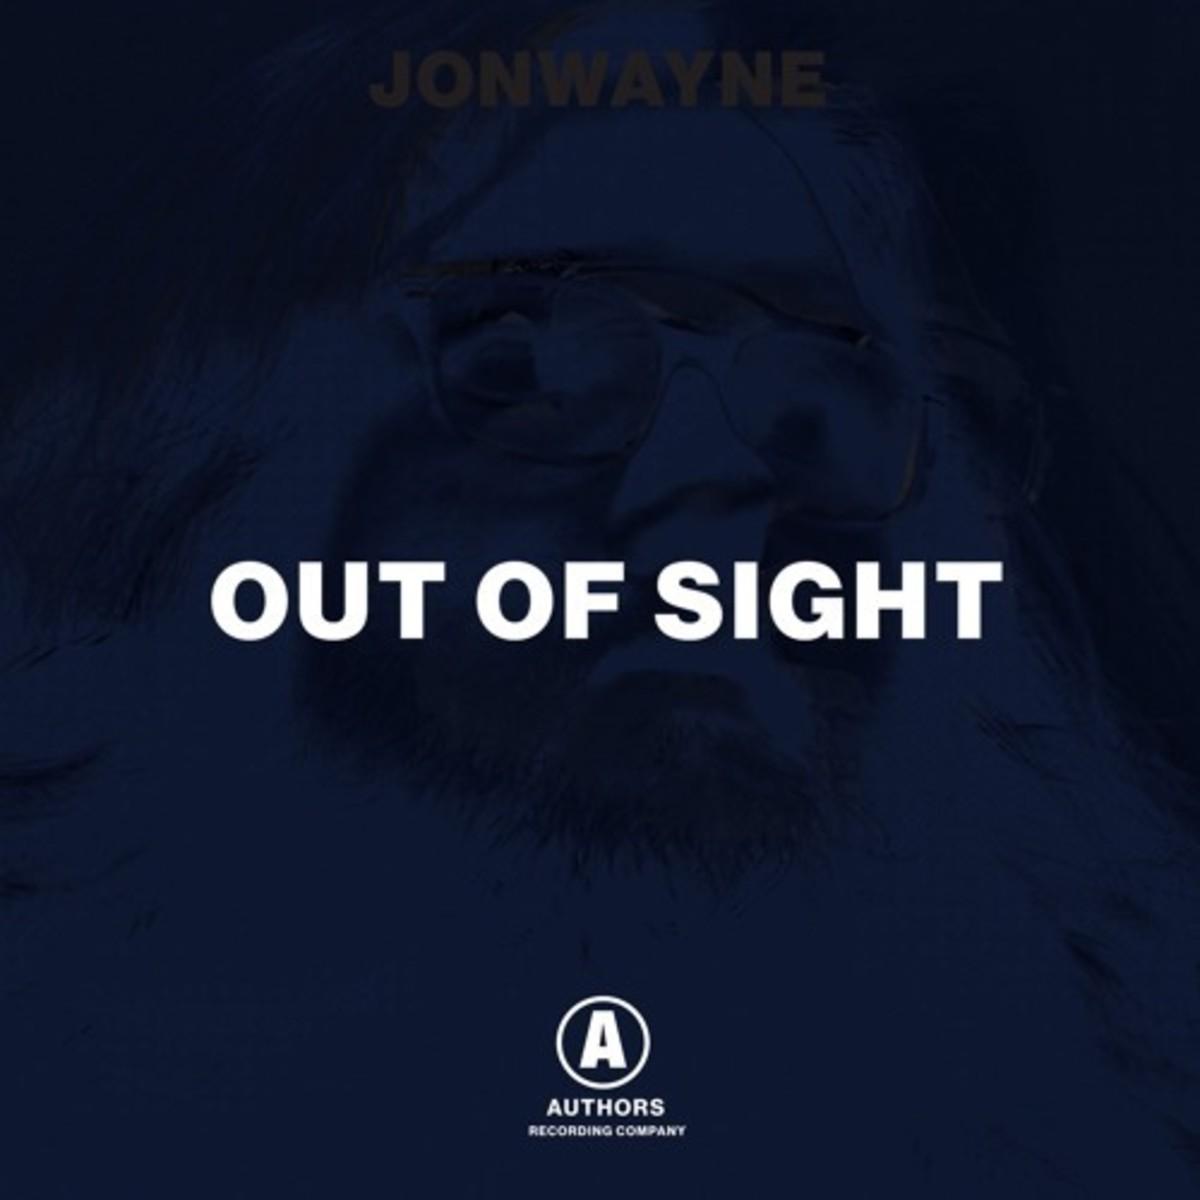 jonwayne-out-of-sight.jpg